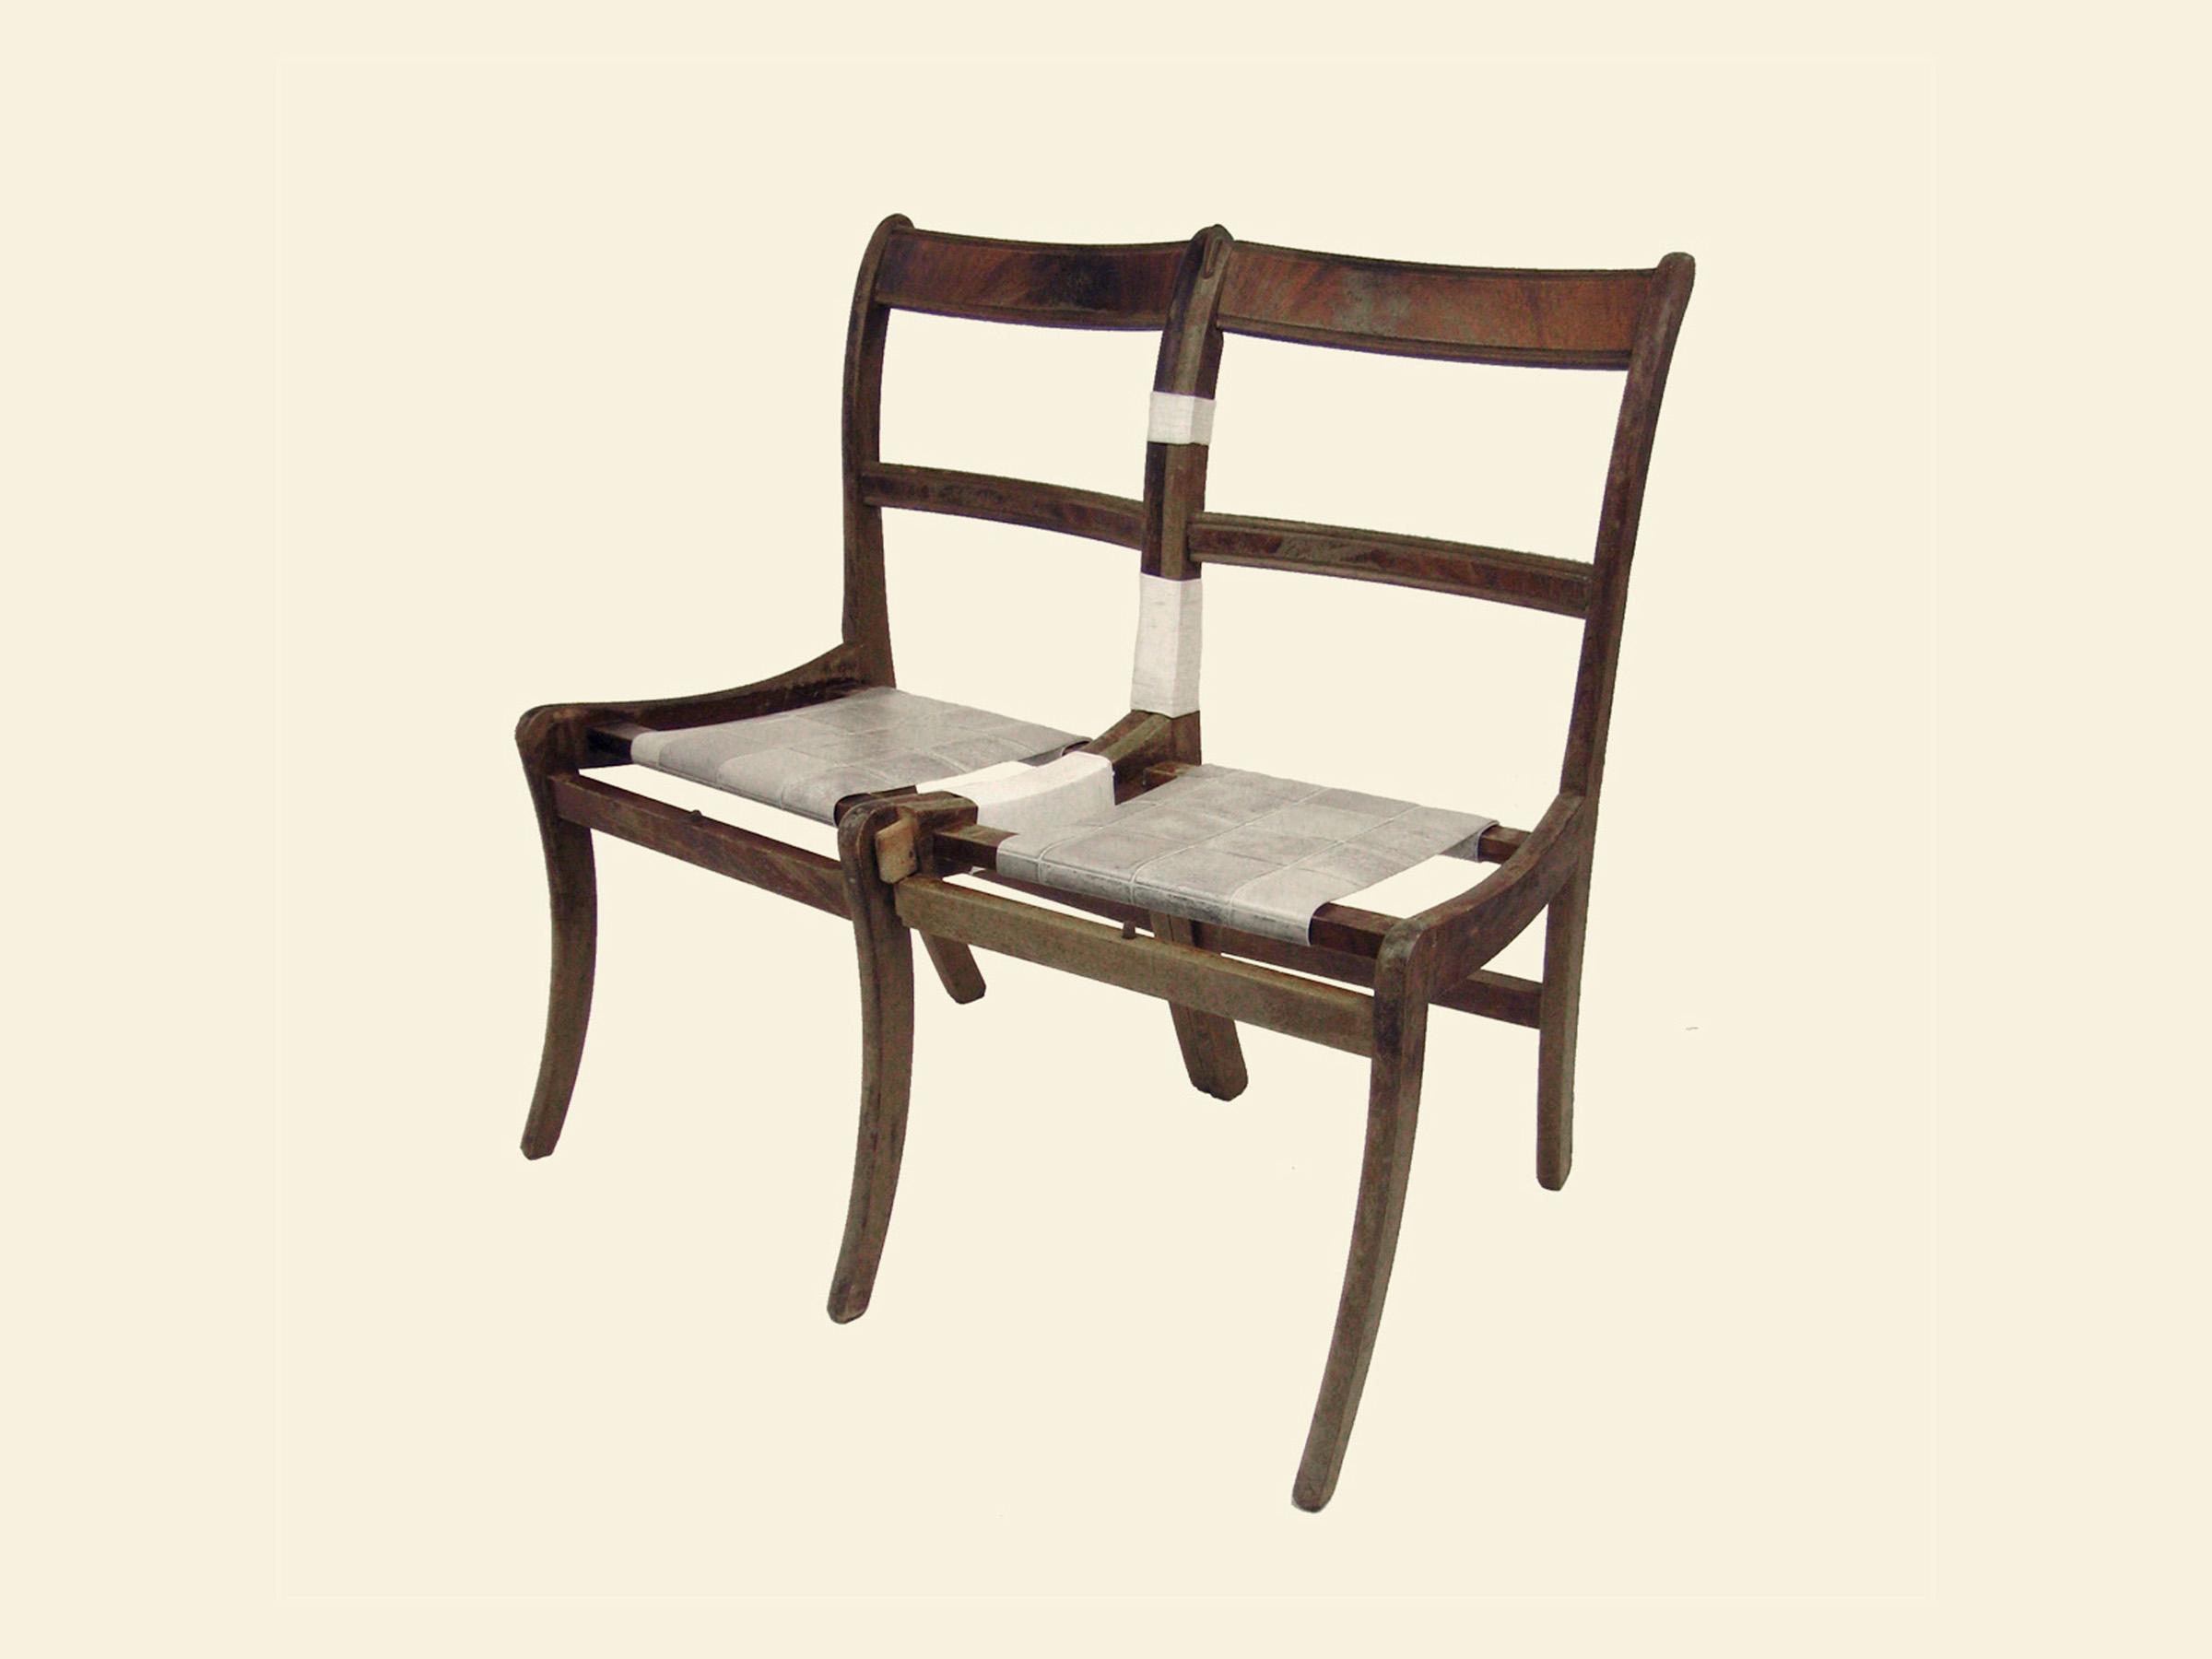 ffixed diningchairs.jpg